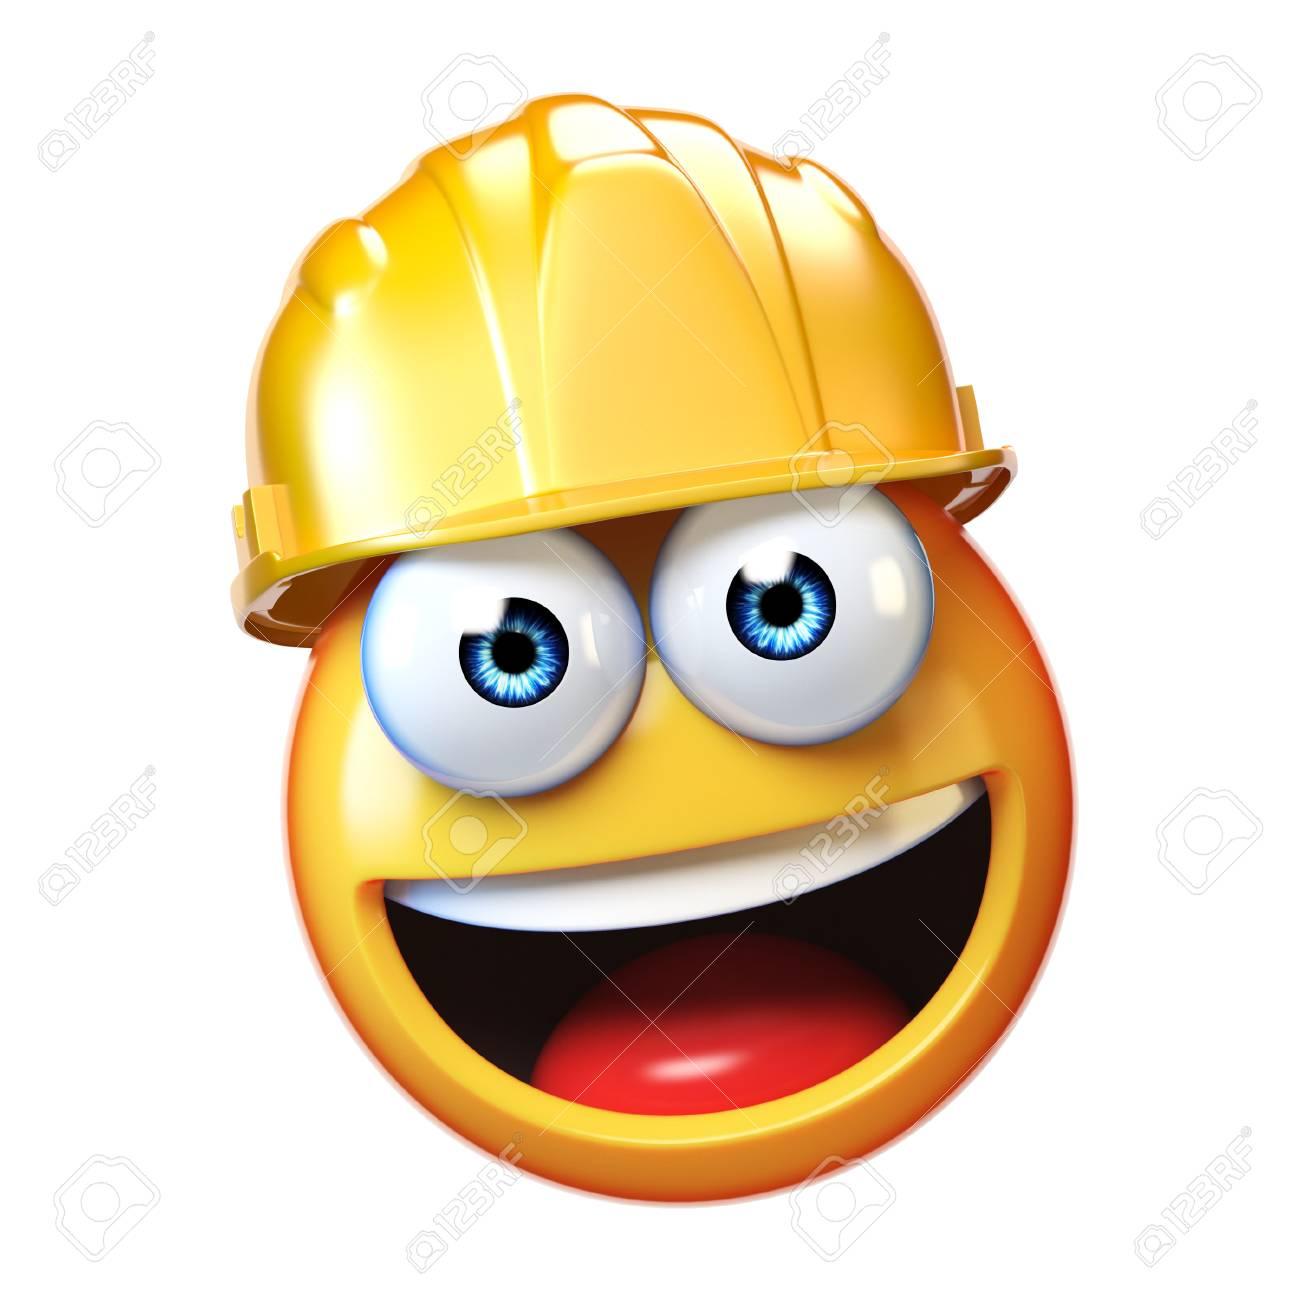 Emoji Construction Worker Isolated On White Background, Emoticon ...